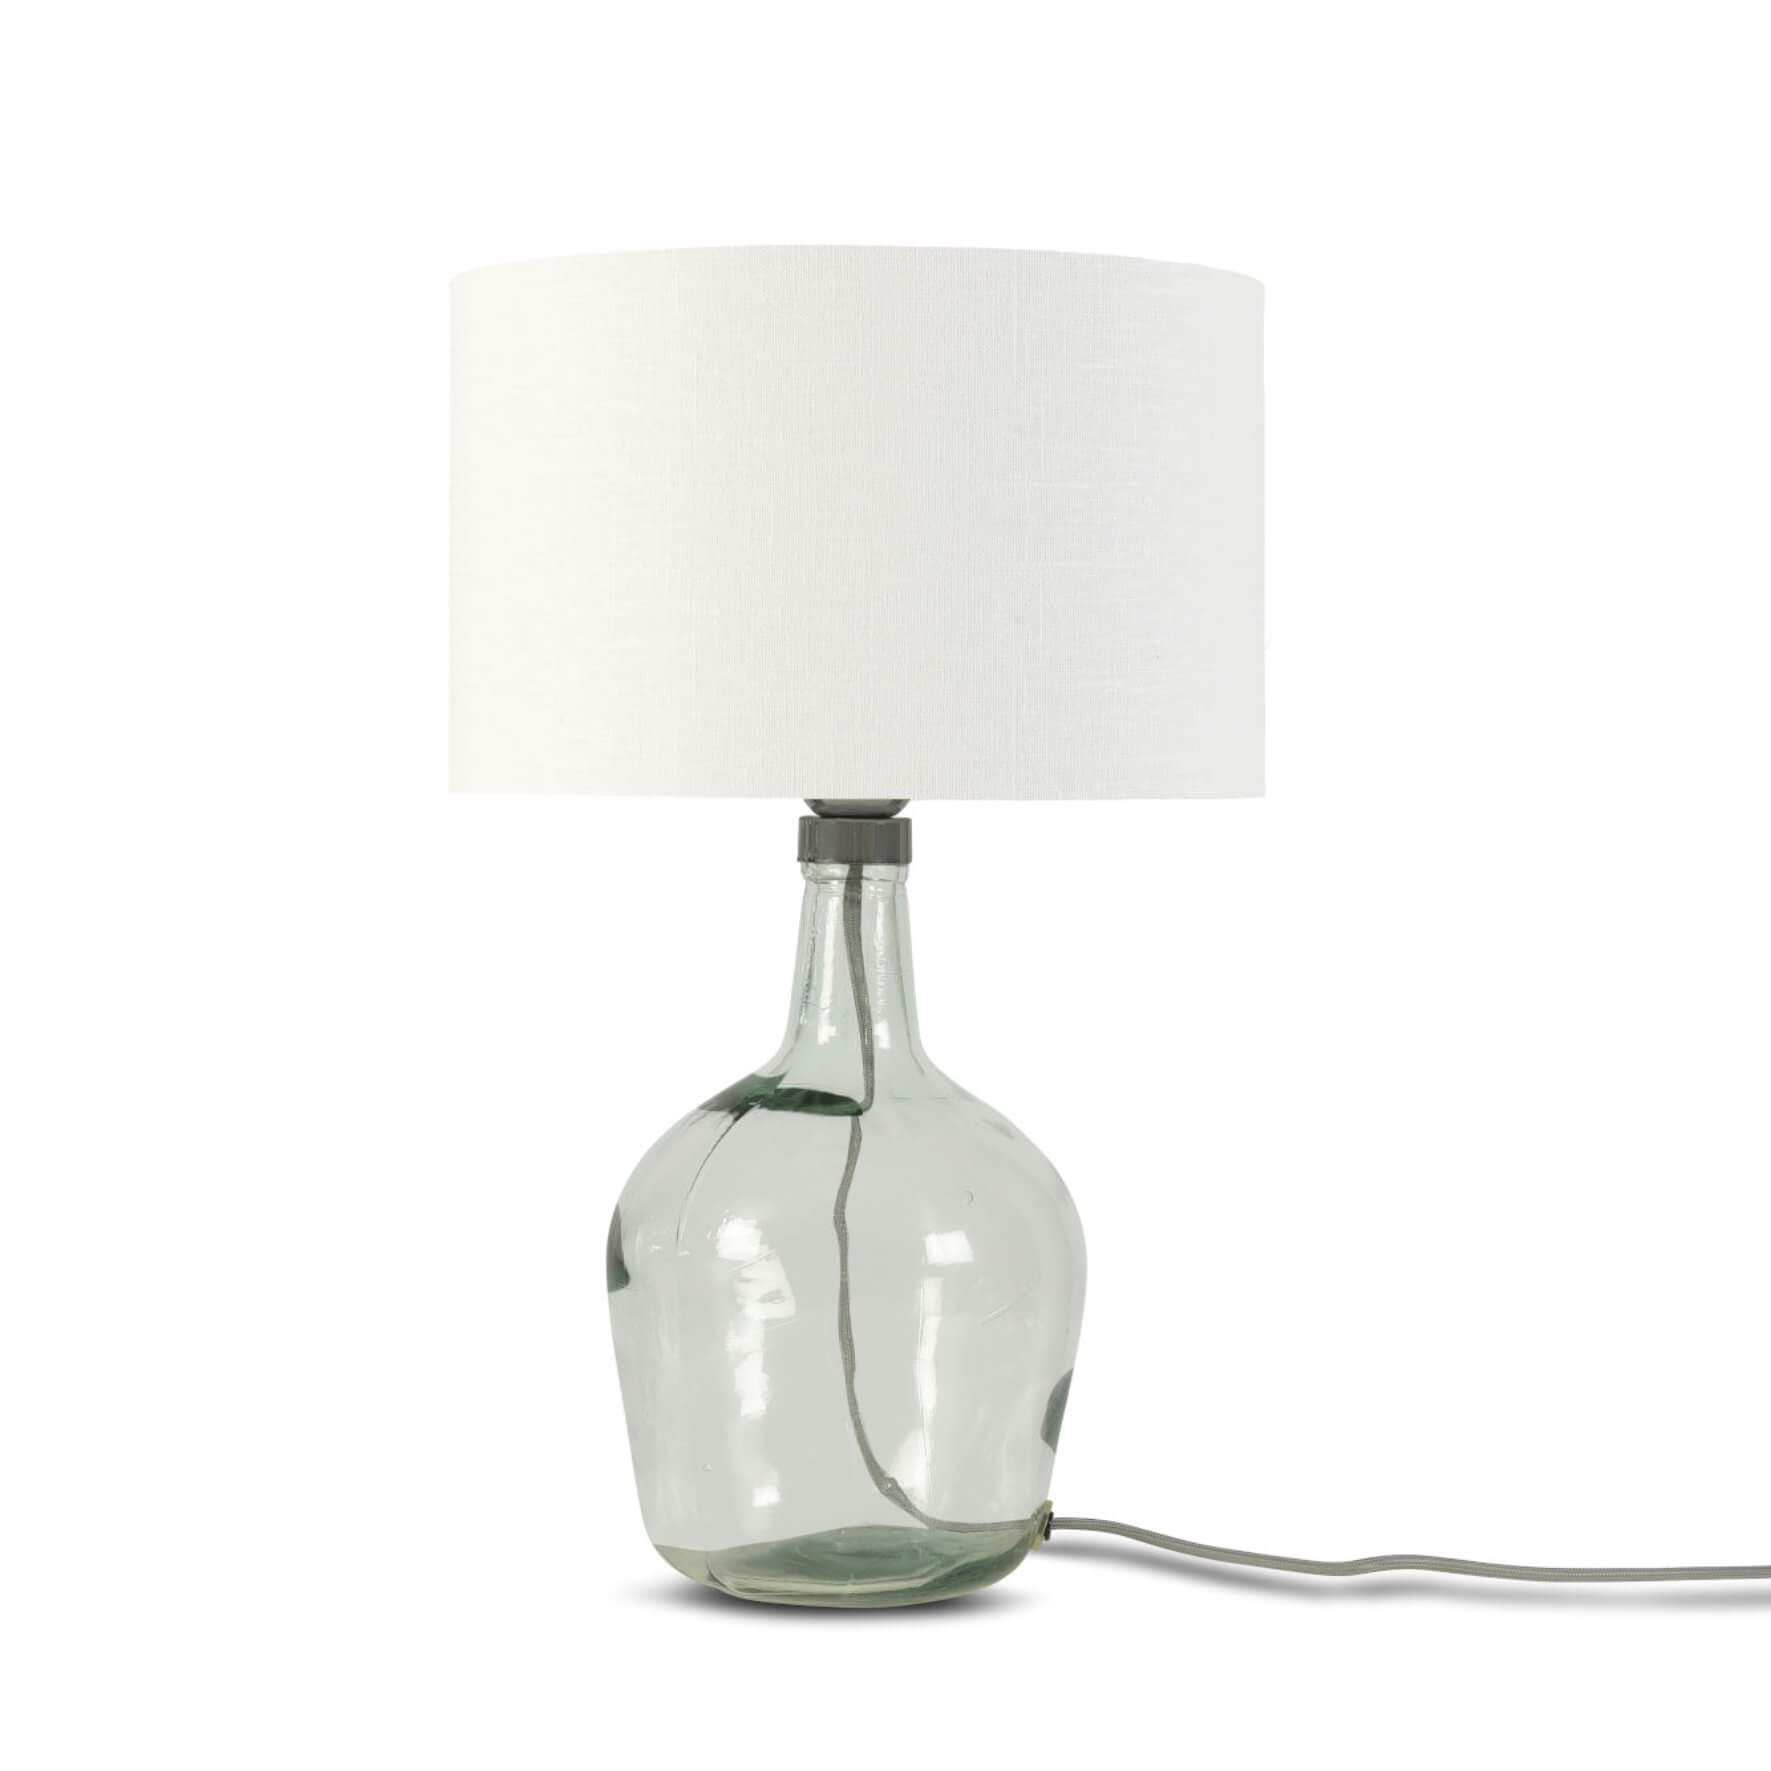 Lampe Murano en verre avec abat-jour blanc - Good & Mojo